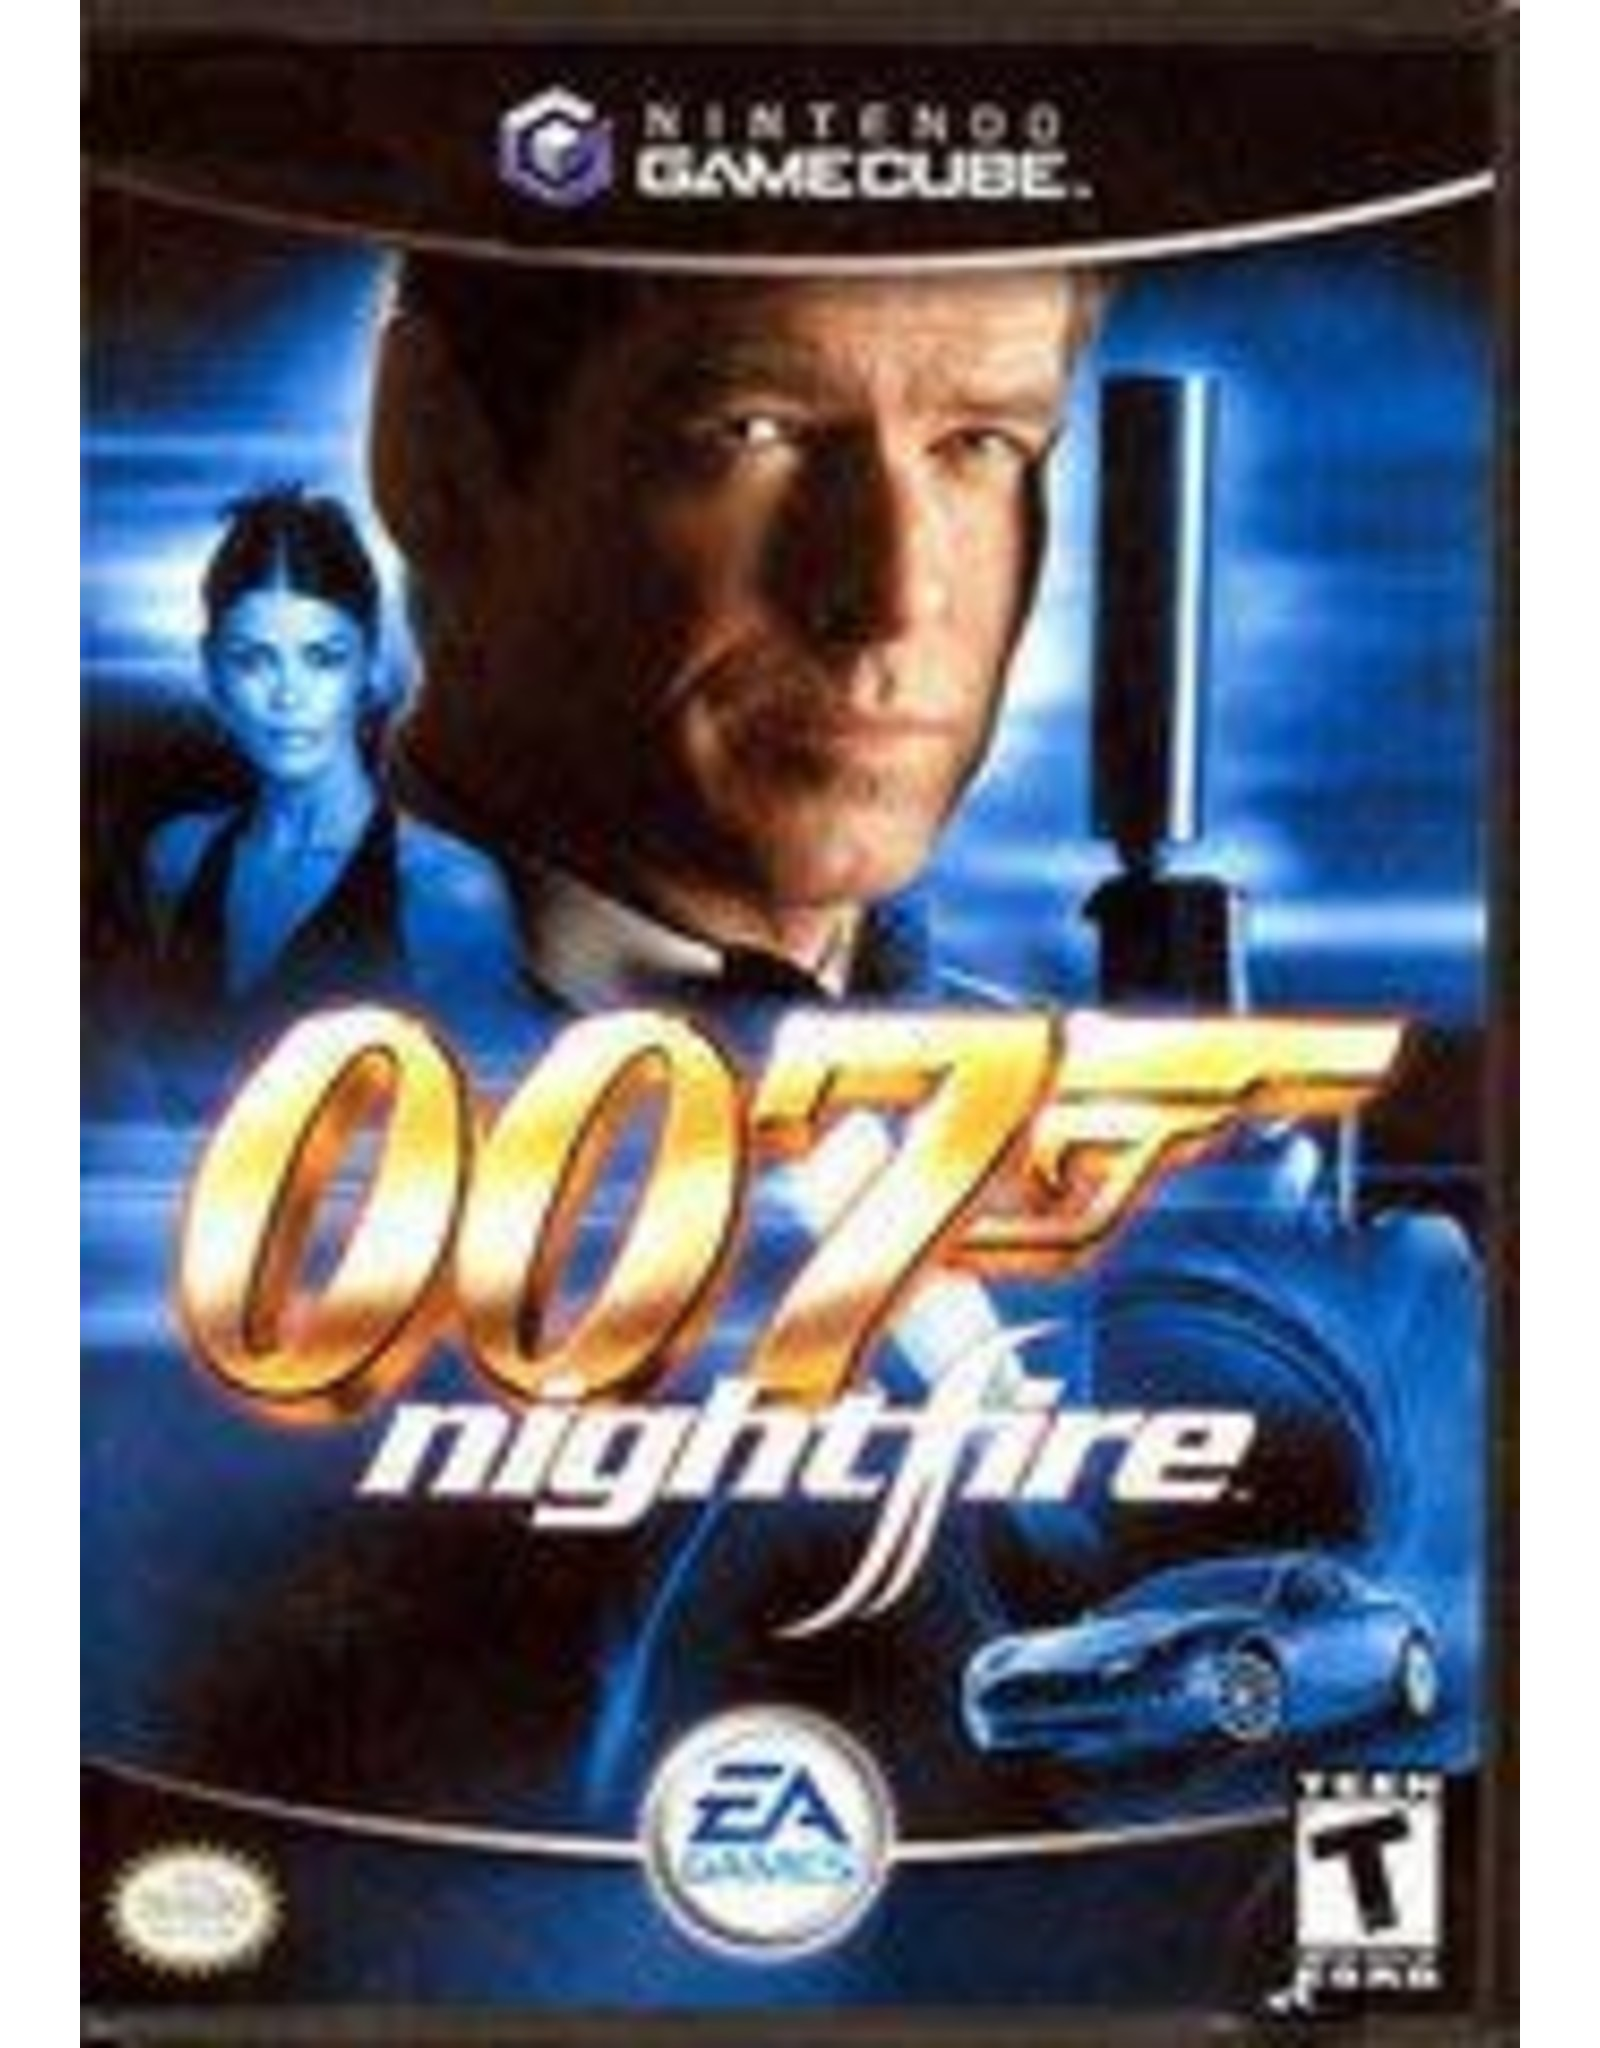 Gamecube 007 Nightfire (No Manual)